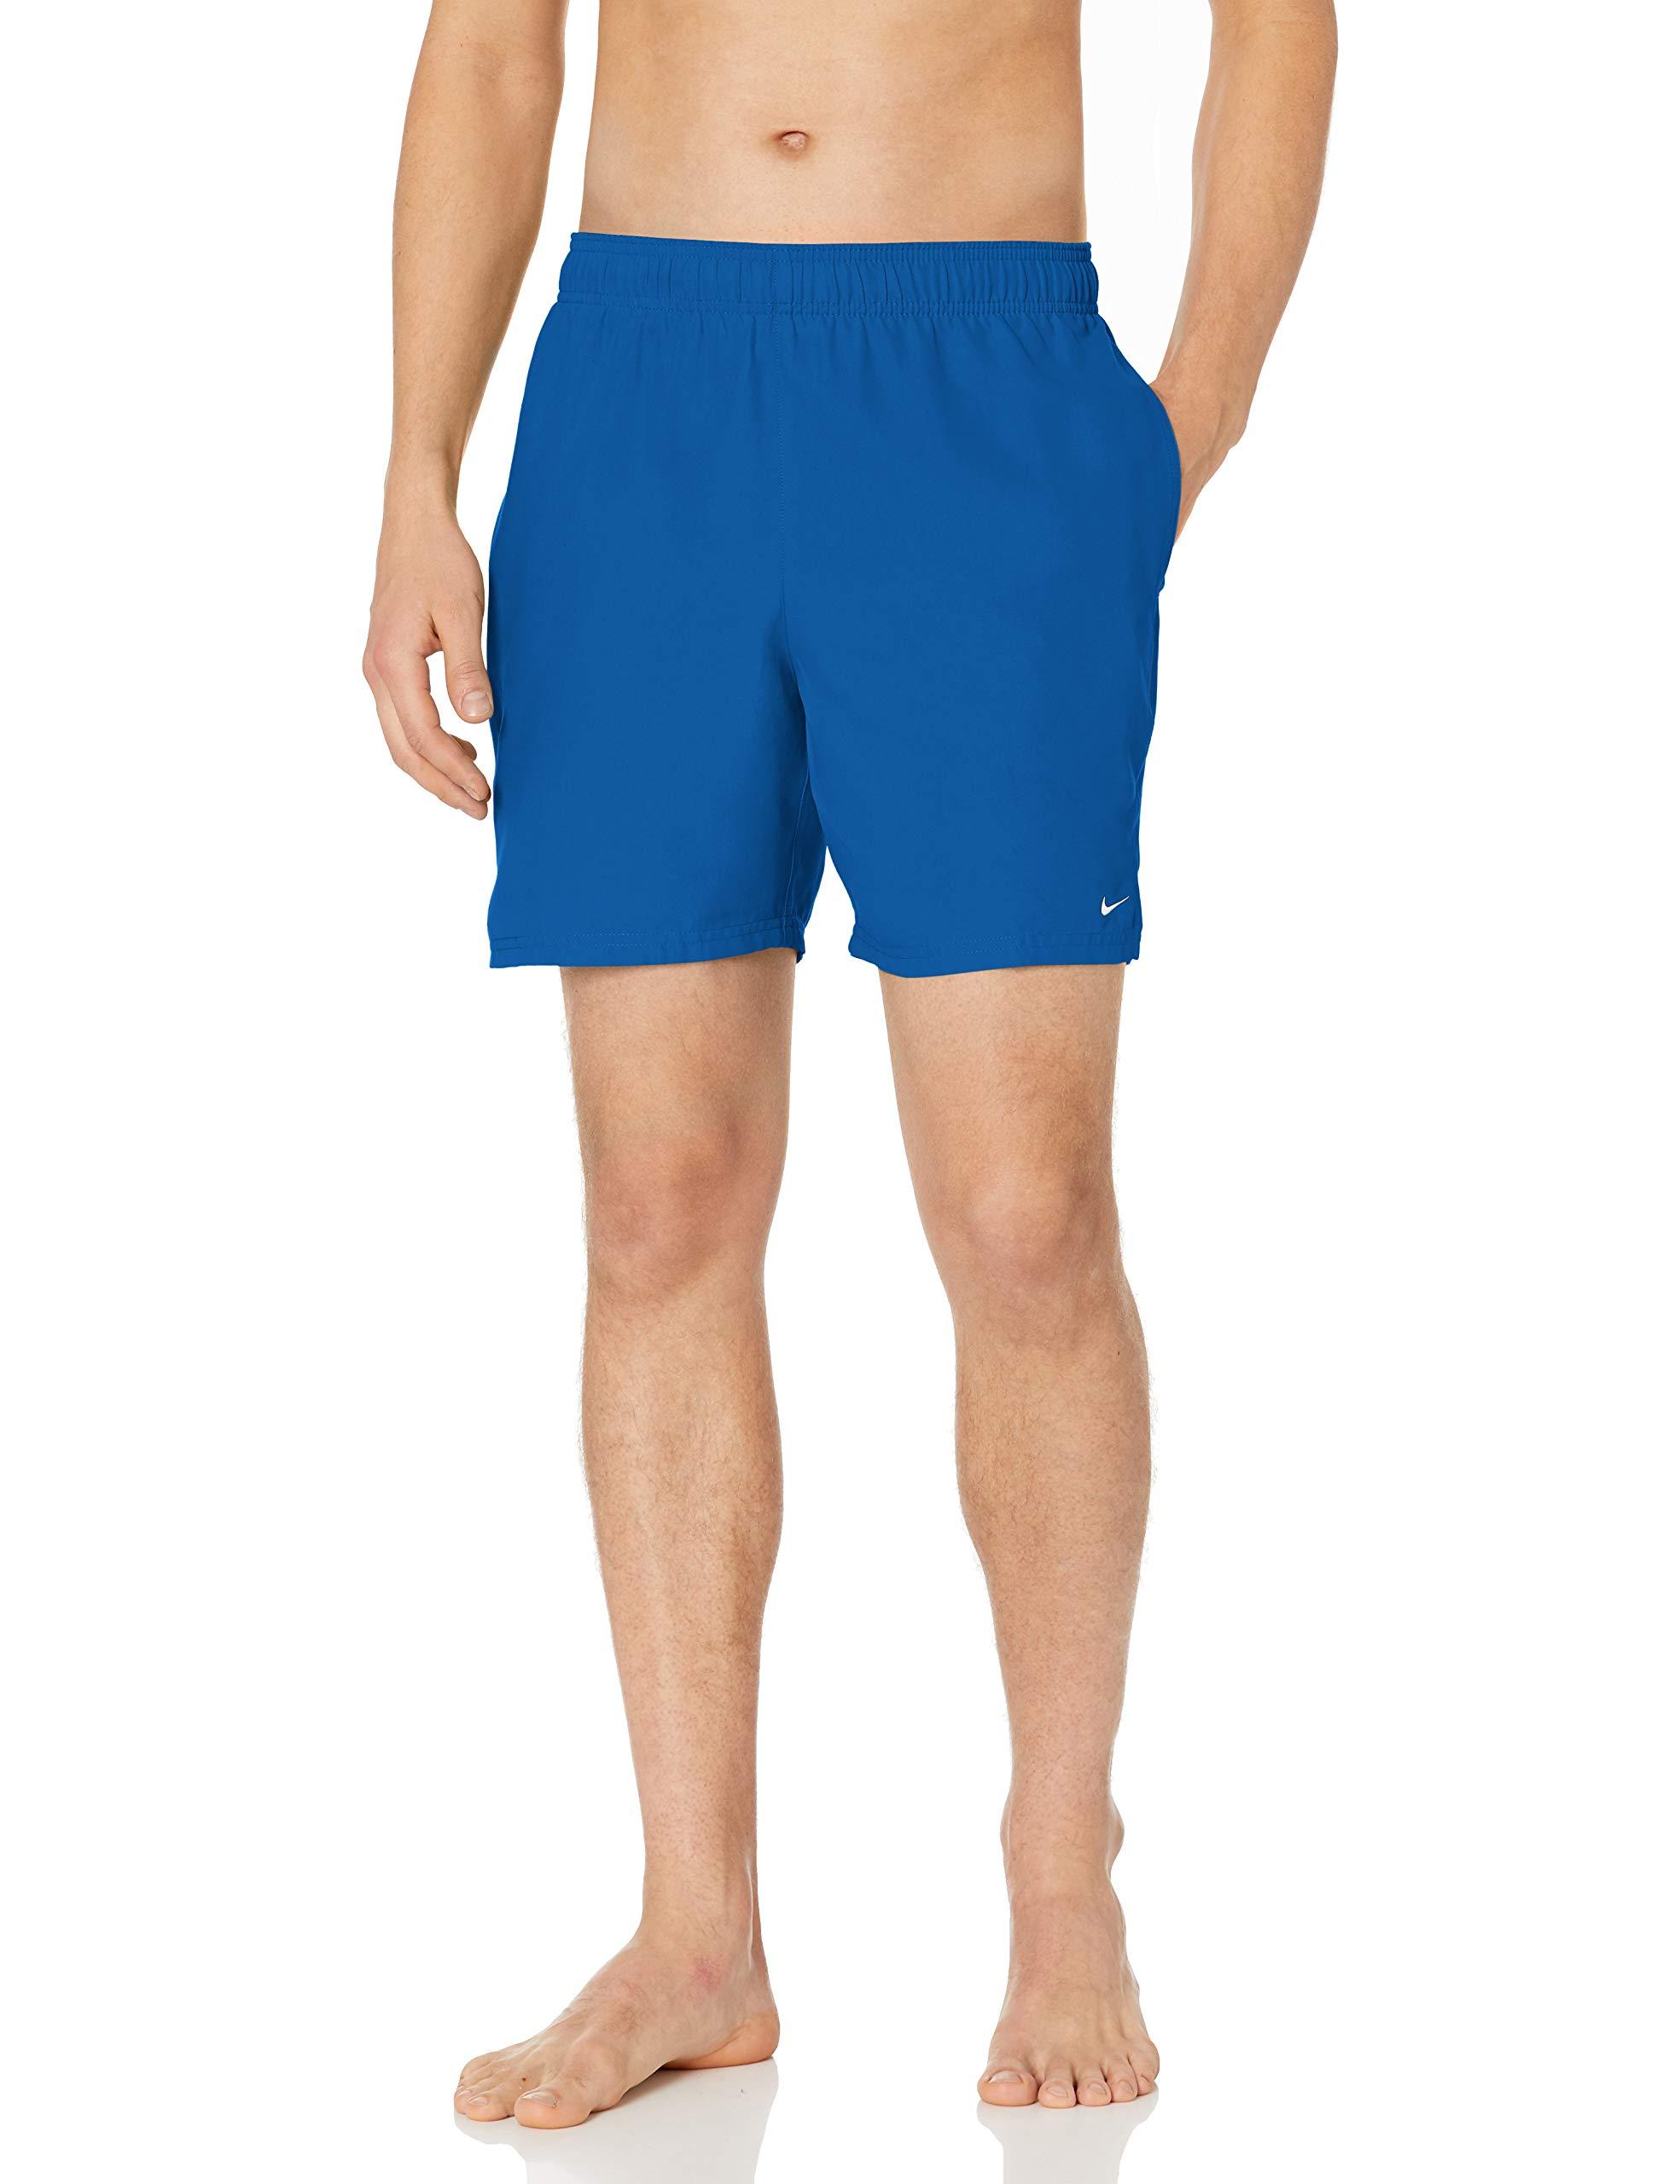 Nike Men's Solid Lap 7″ Volley Short Swim Trunk